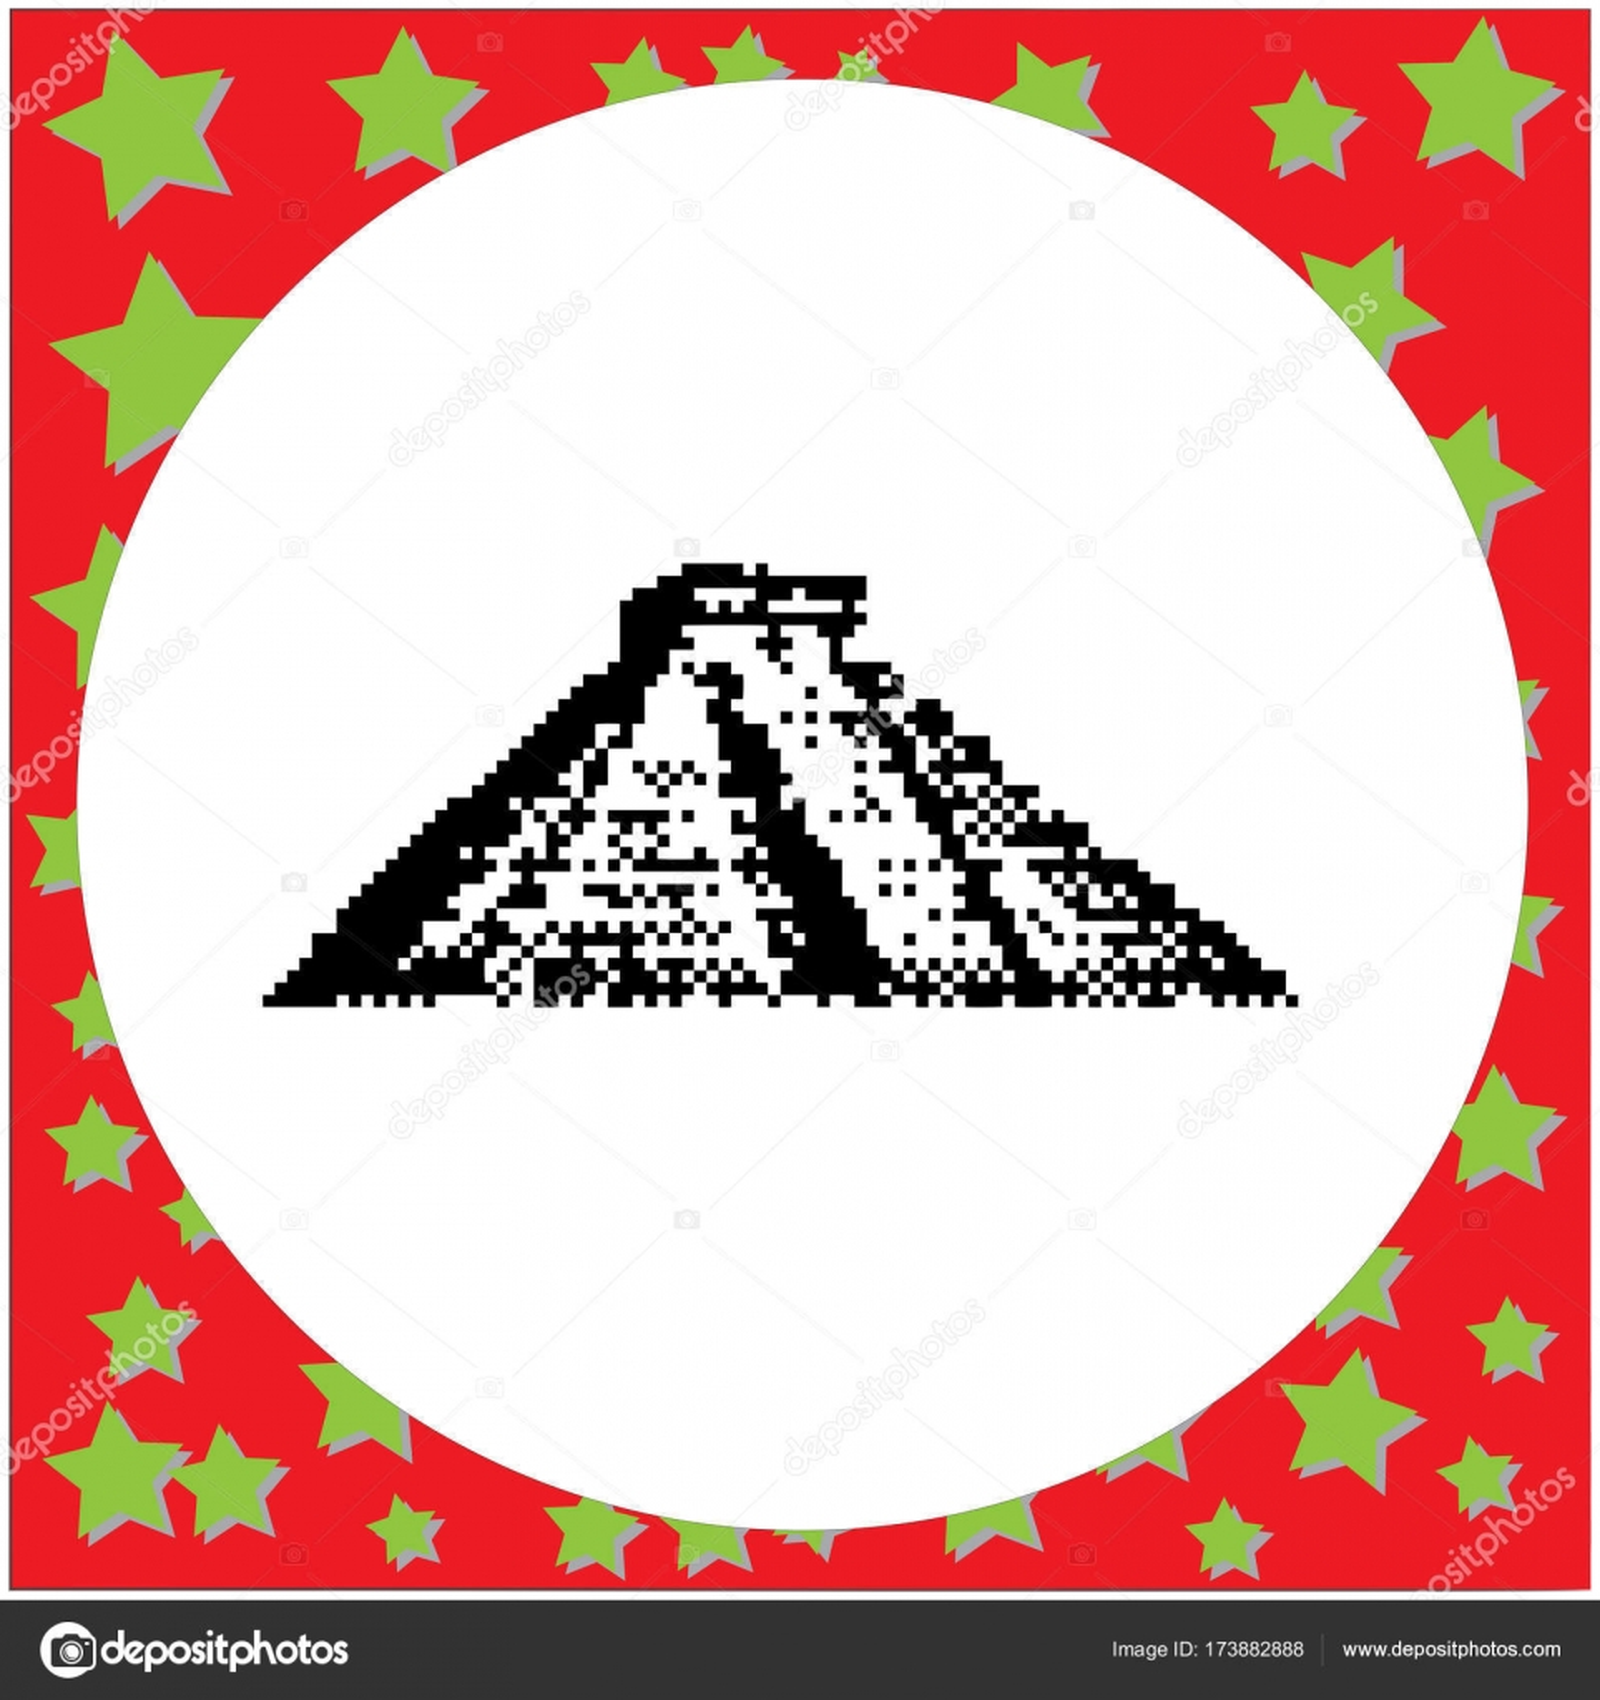 Pir Mide Maya De Kukulc N El Castillo En La Ilustraci N De Vector  # Muebles Kukulcan